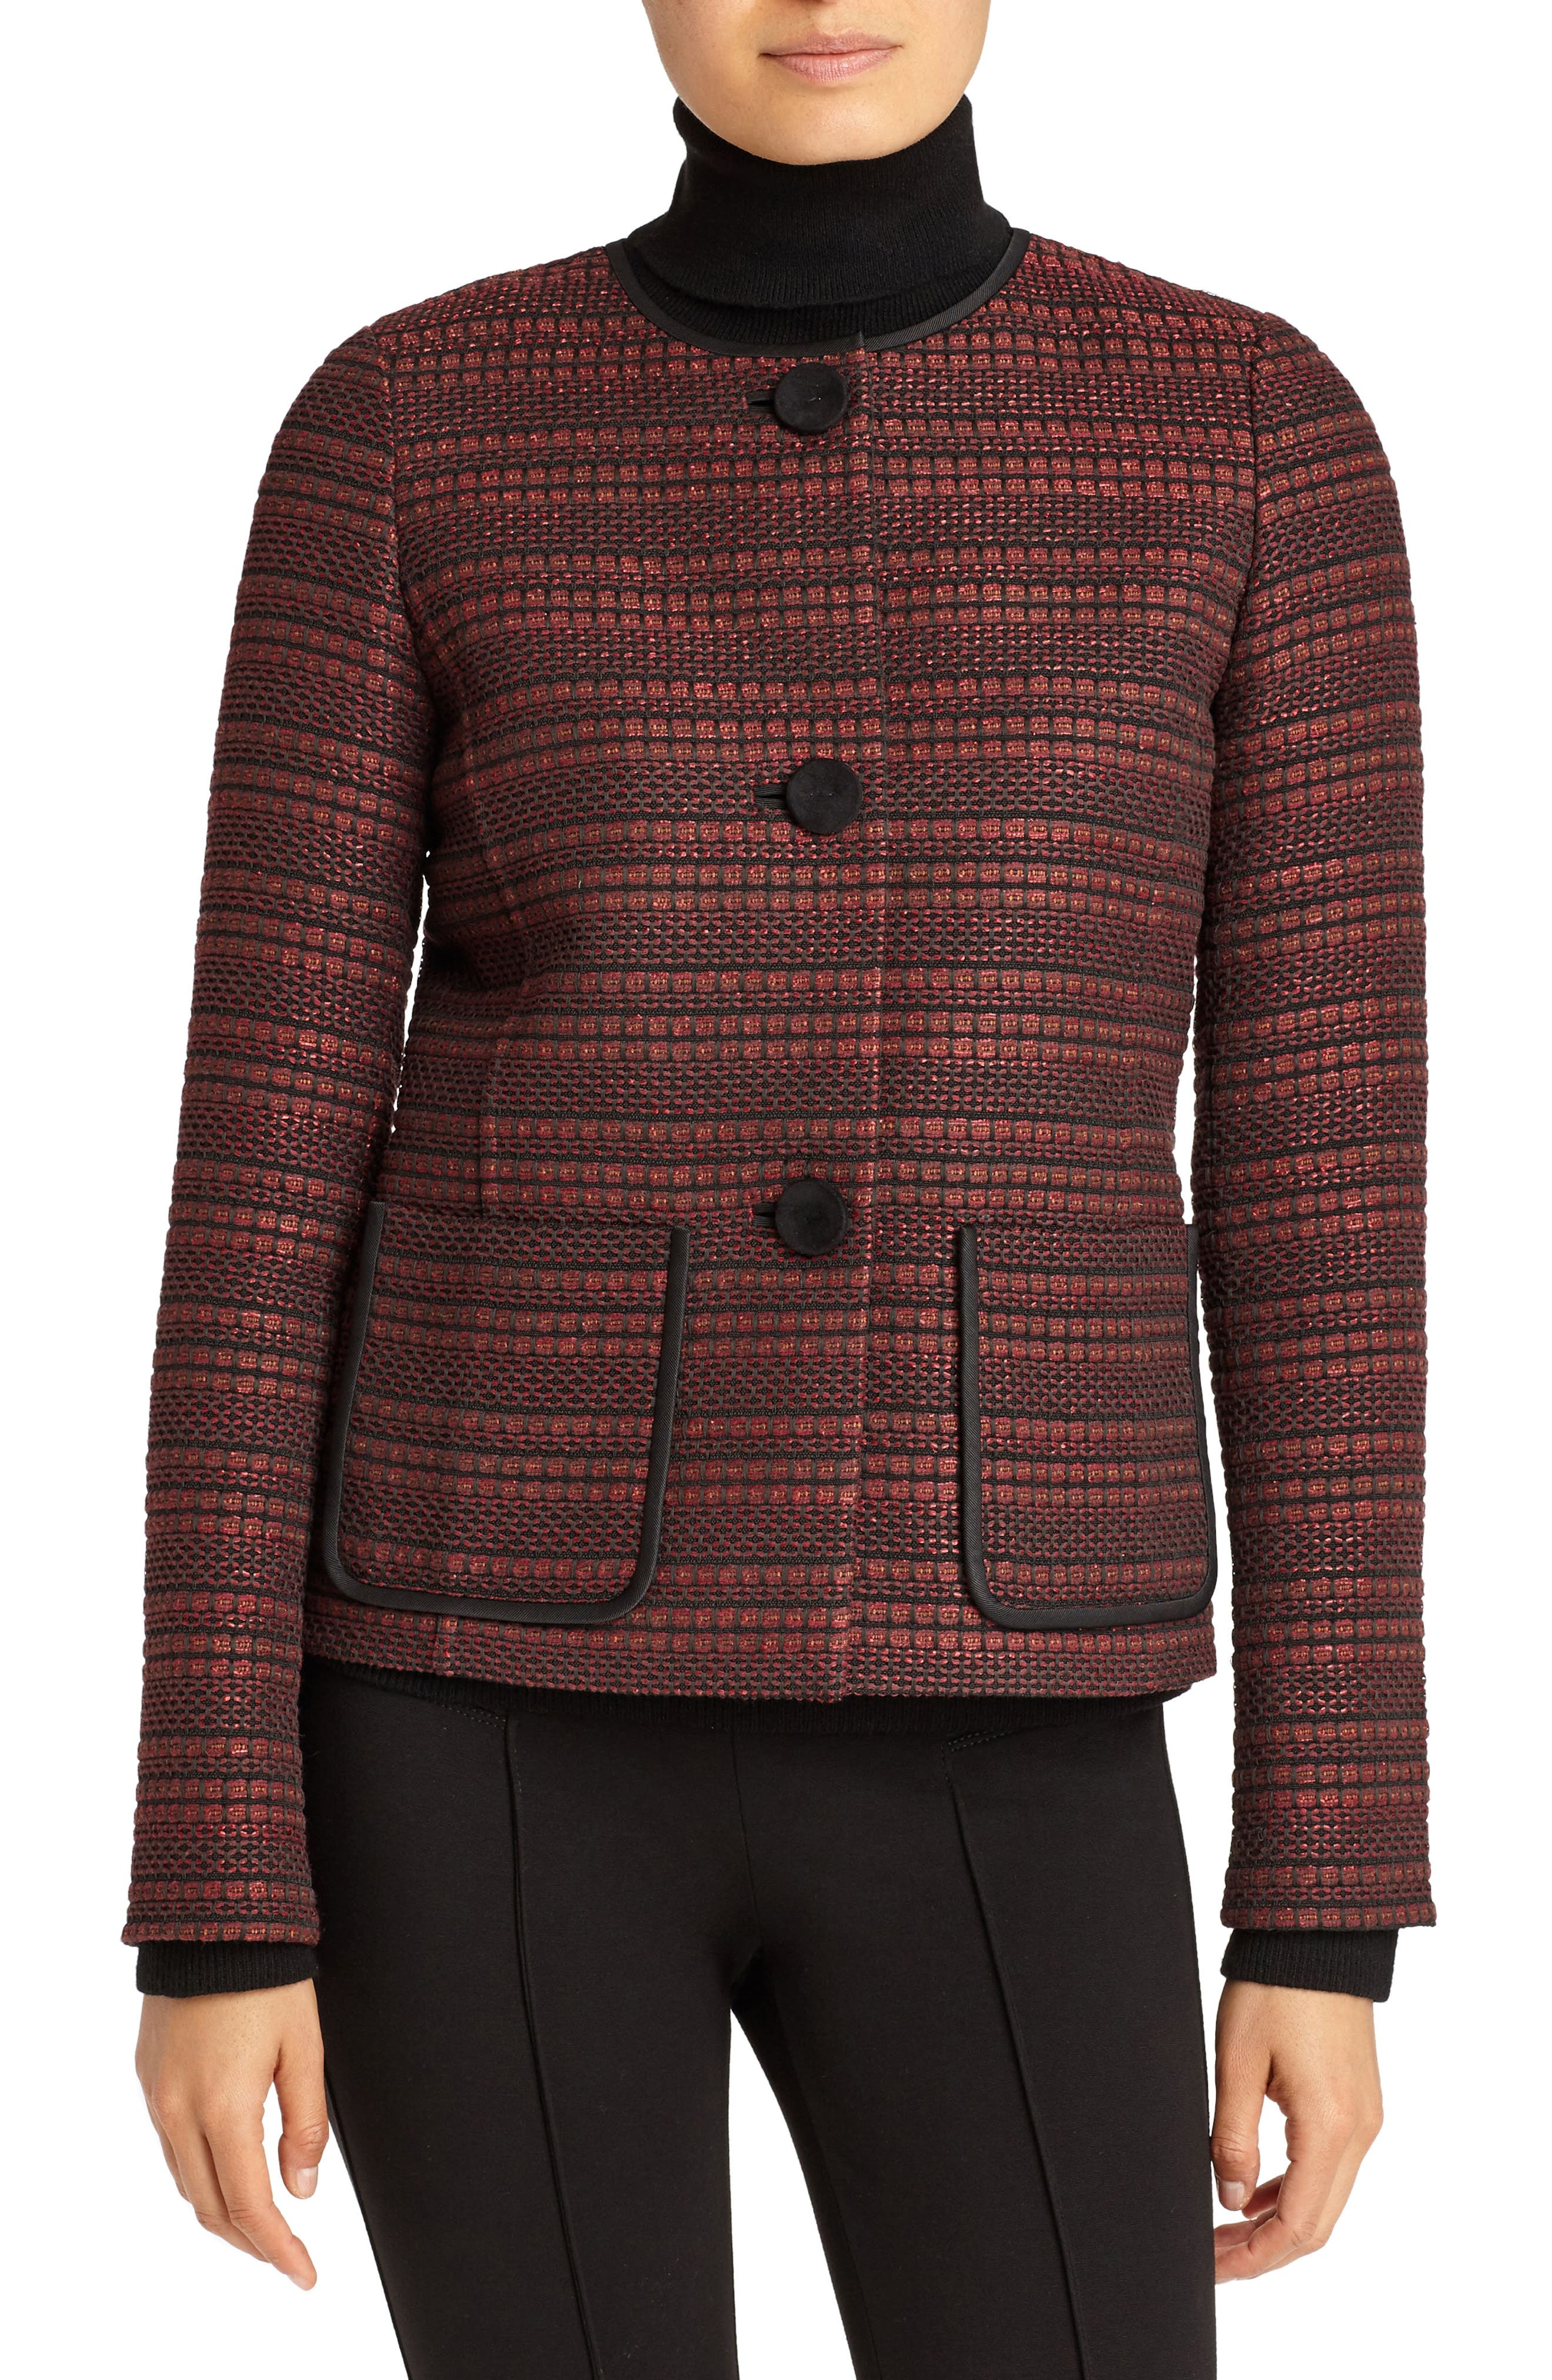 Laurence Venetian Tweed Jacket,                             Main thumbnail 1, color,                             Shiraz Multi